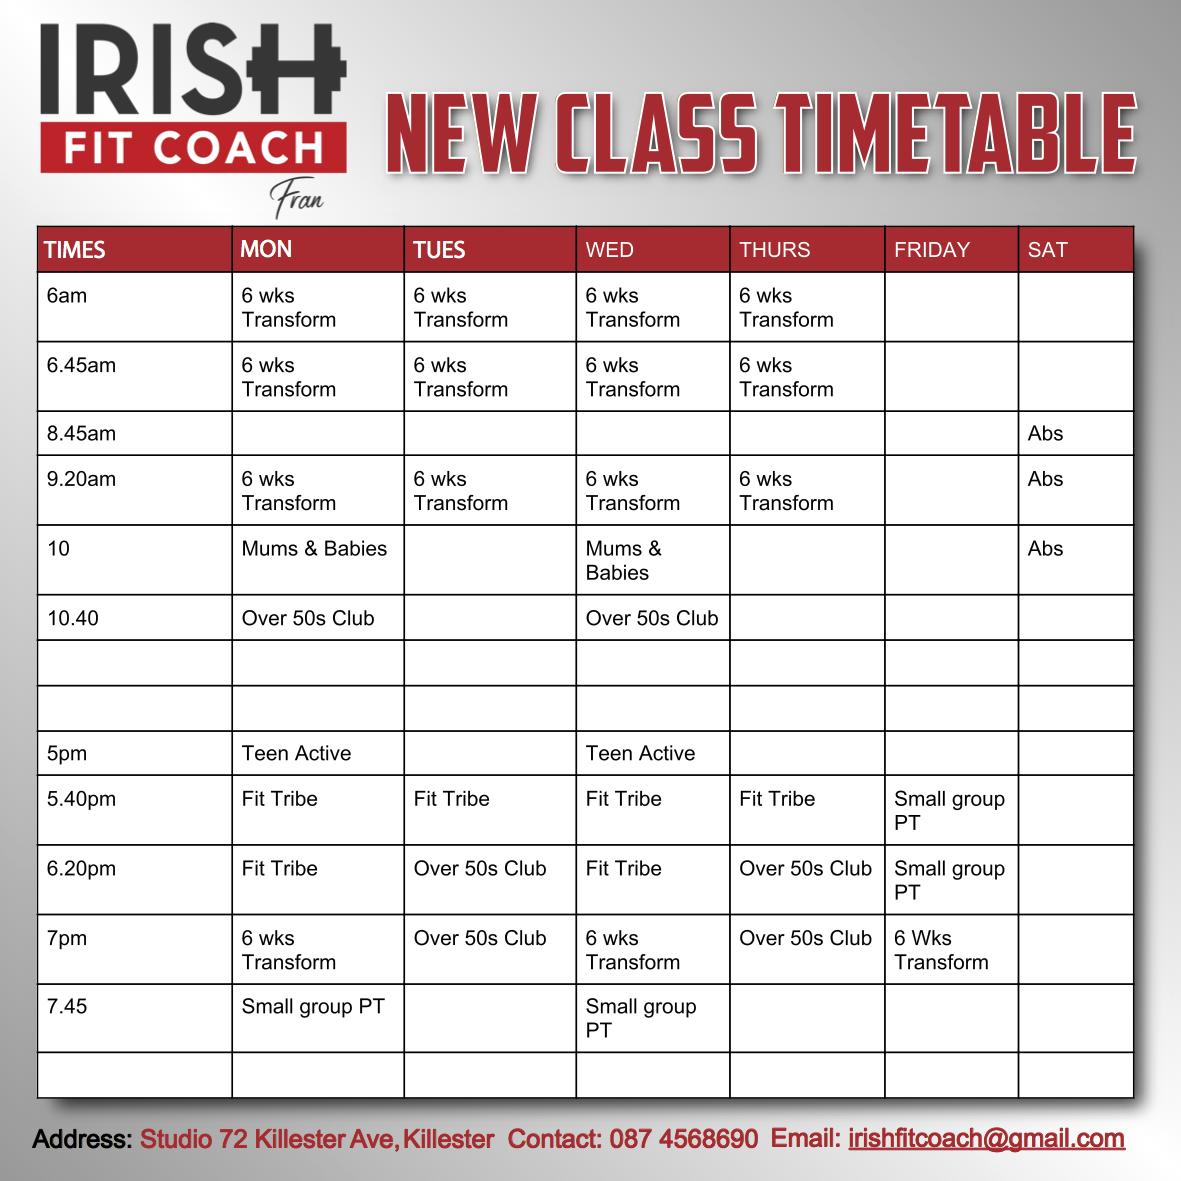 IRISH FIT COACH Timetable